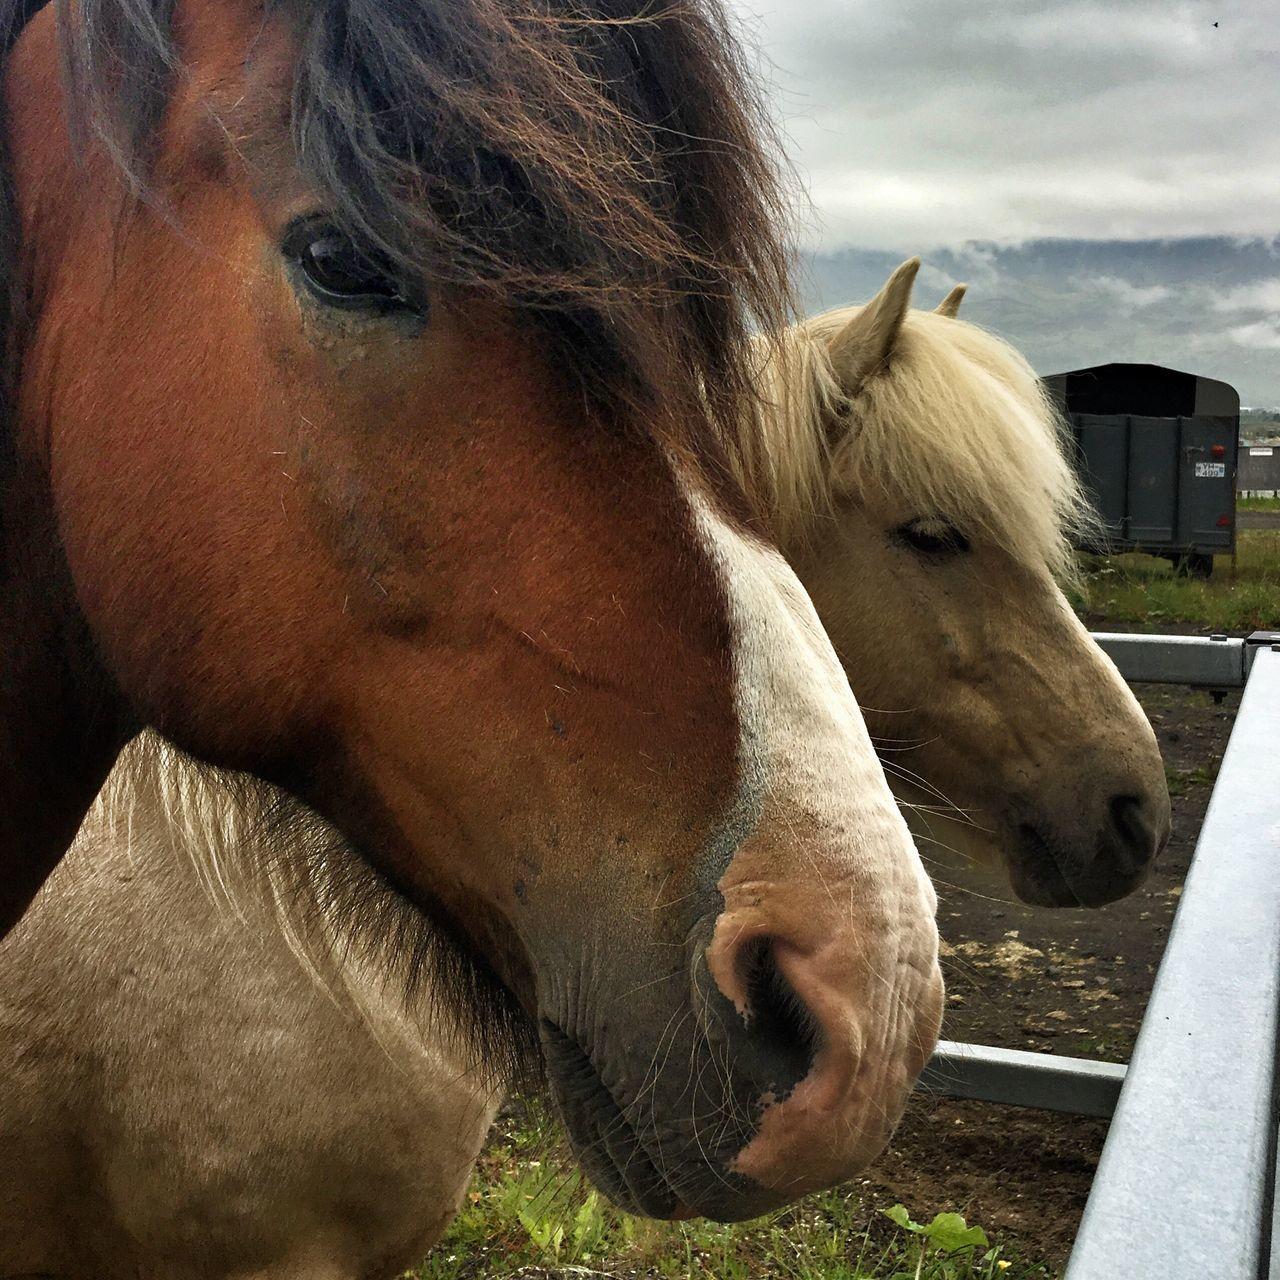 horse, domestic animals, animal themes, livestock, one animal, mammal, animal head, herbivorous, day, outdoors, field, close-up, portrait, no people, sky